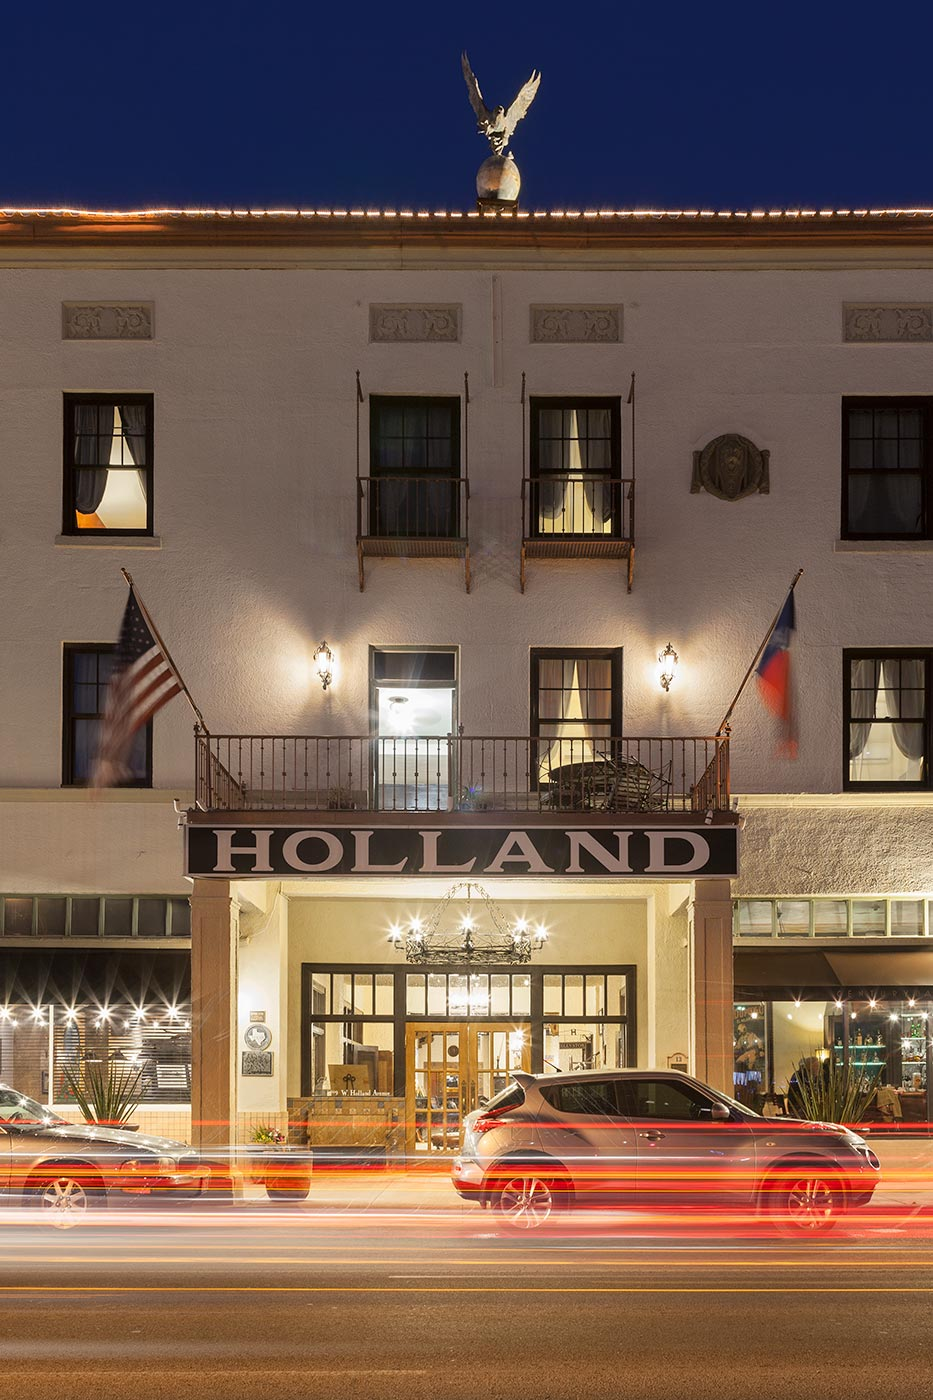 Travel-ABP-Holland-Hotel.jpg